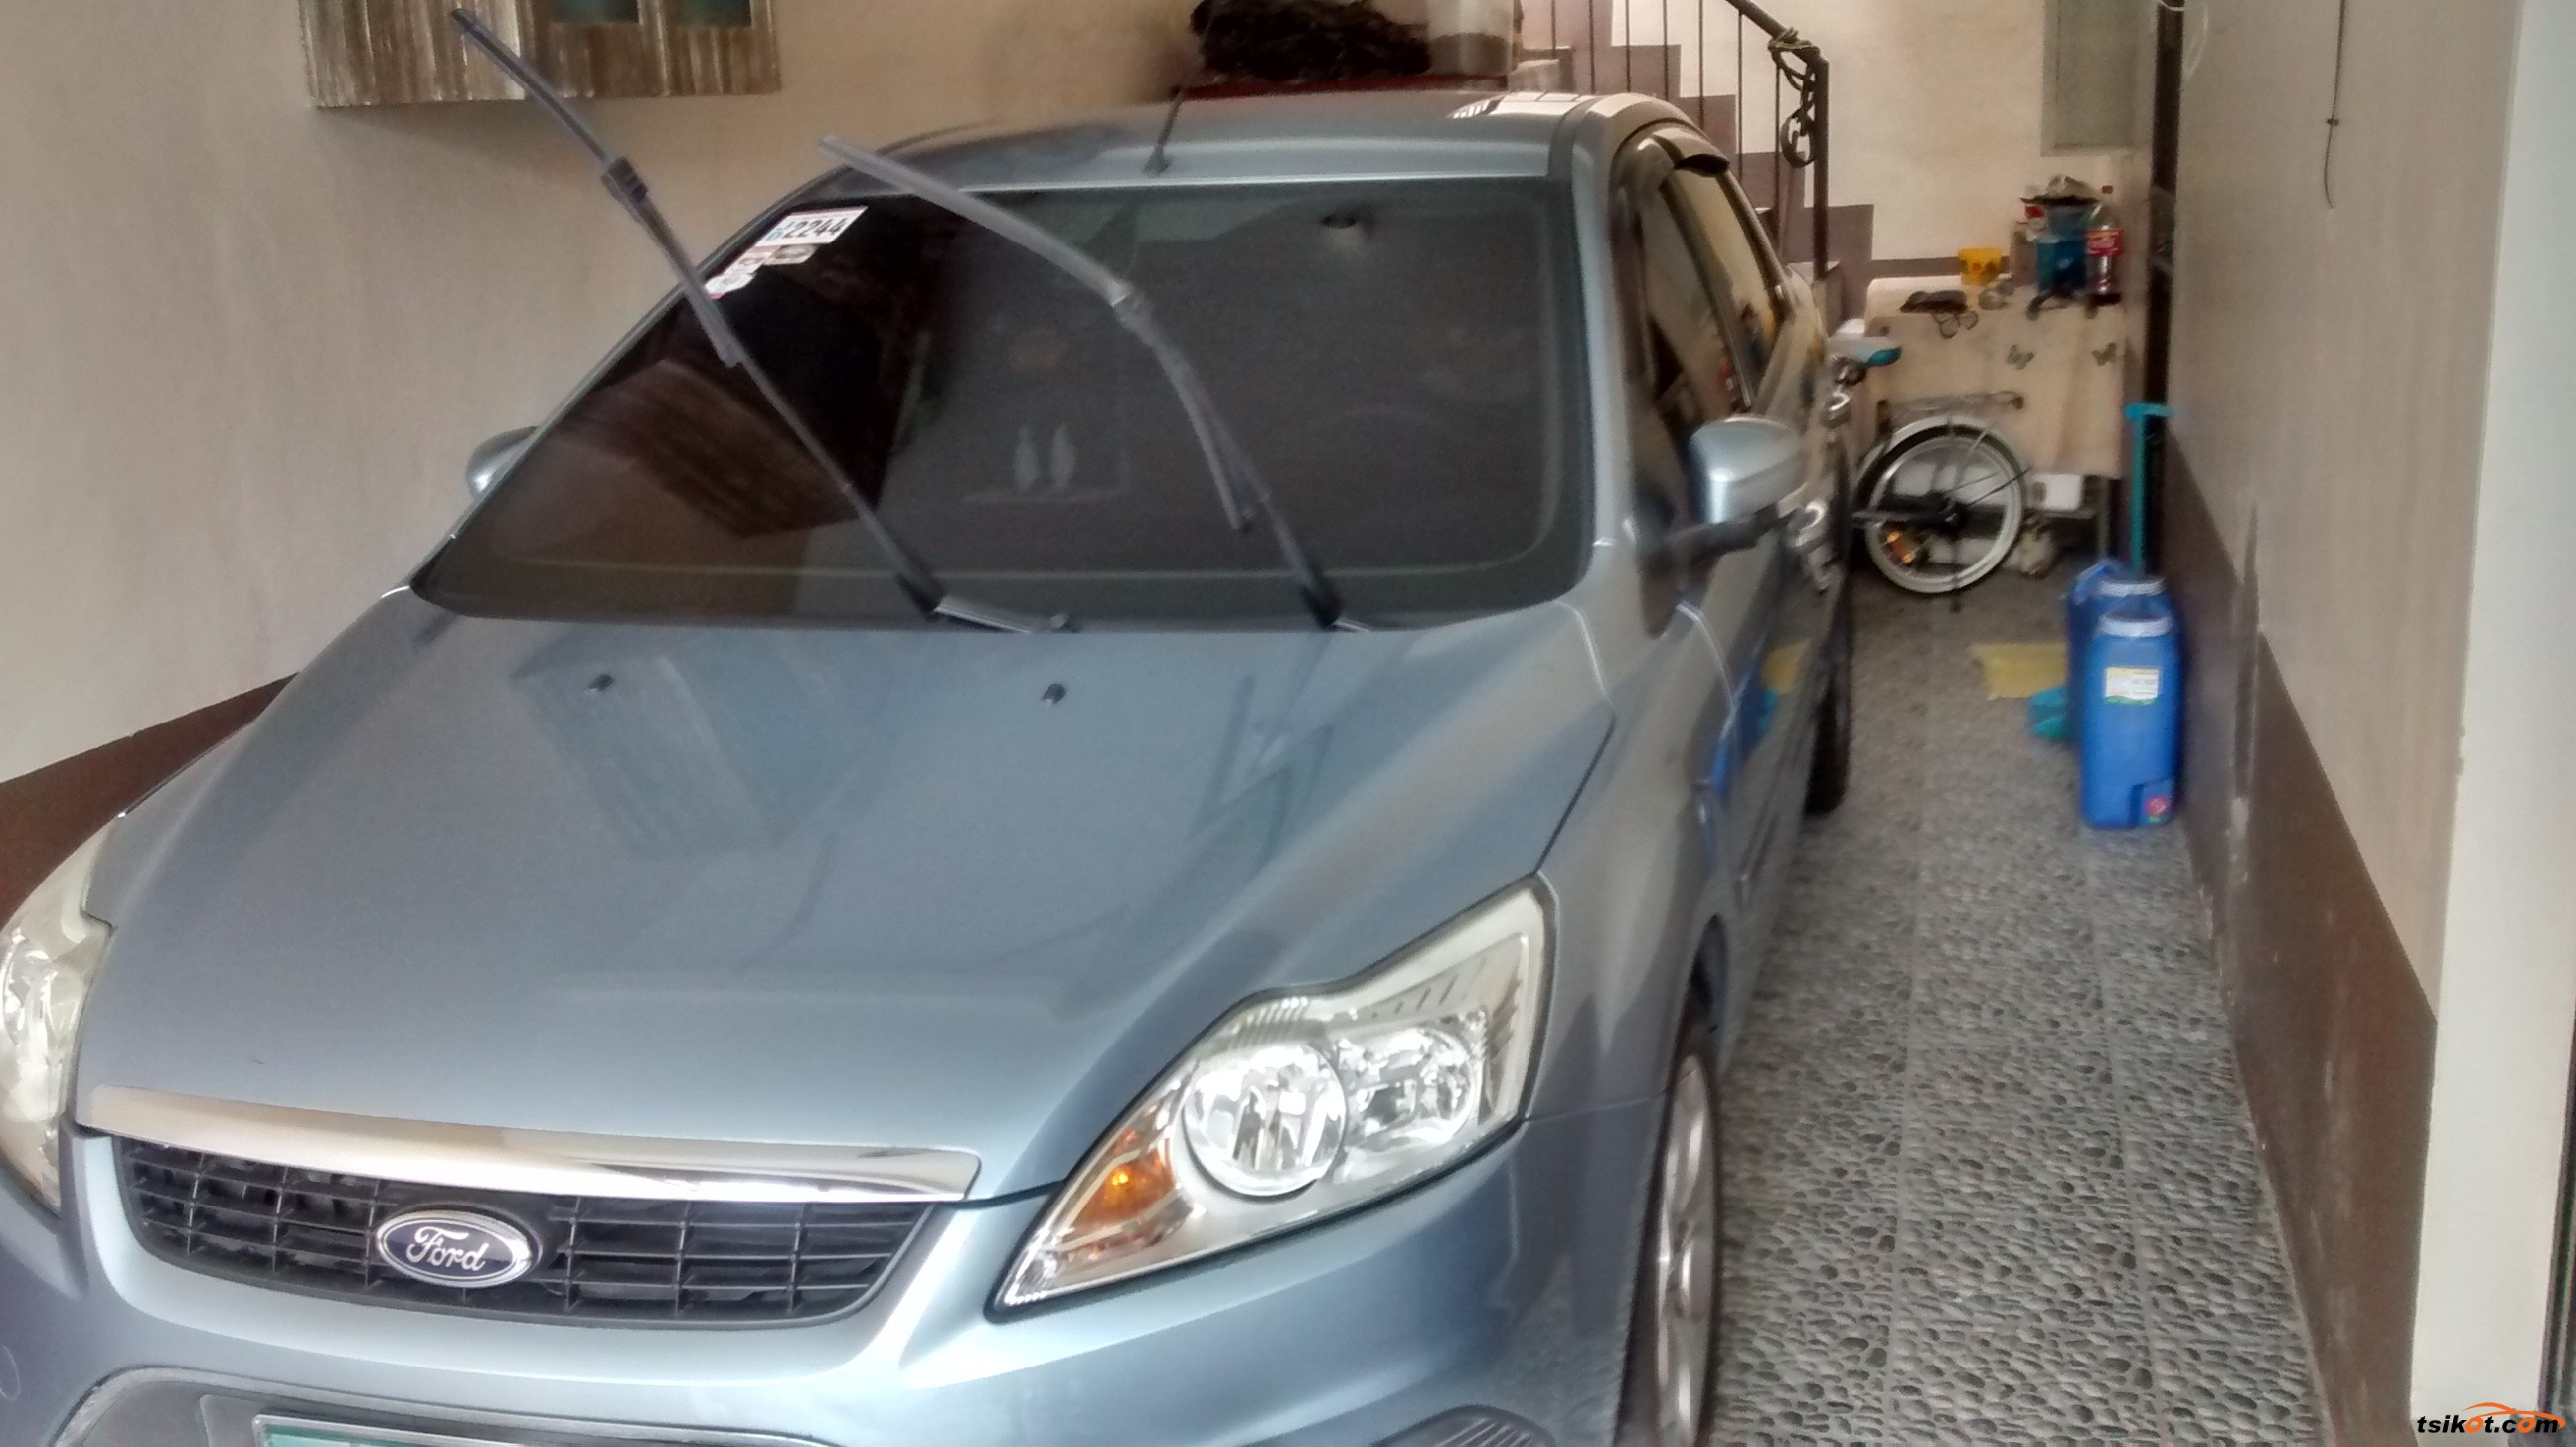 Ford Focus 2011 - 3